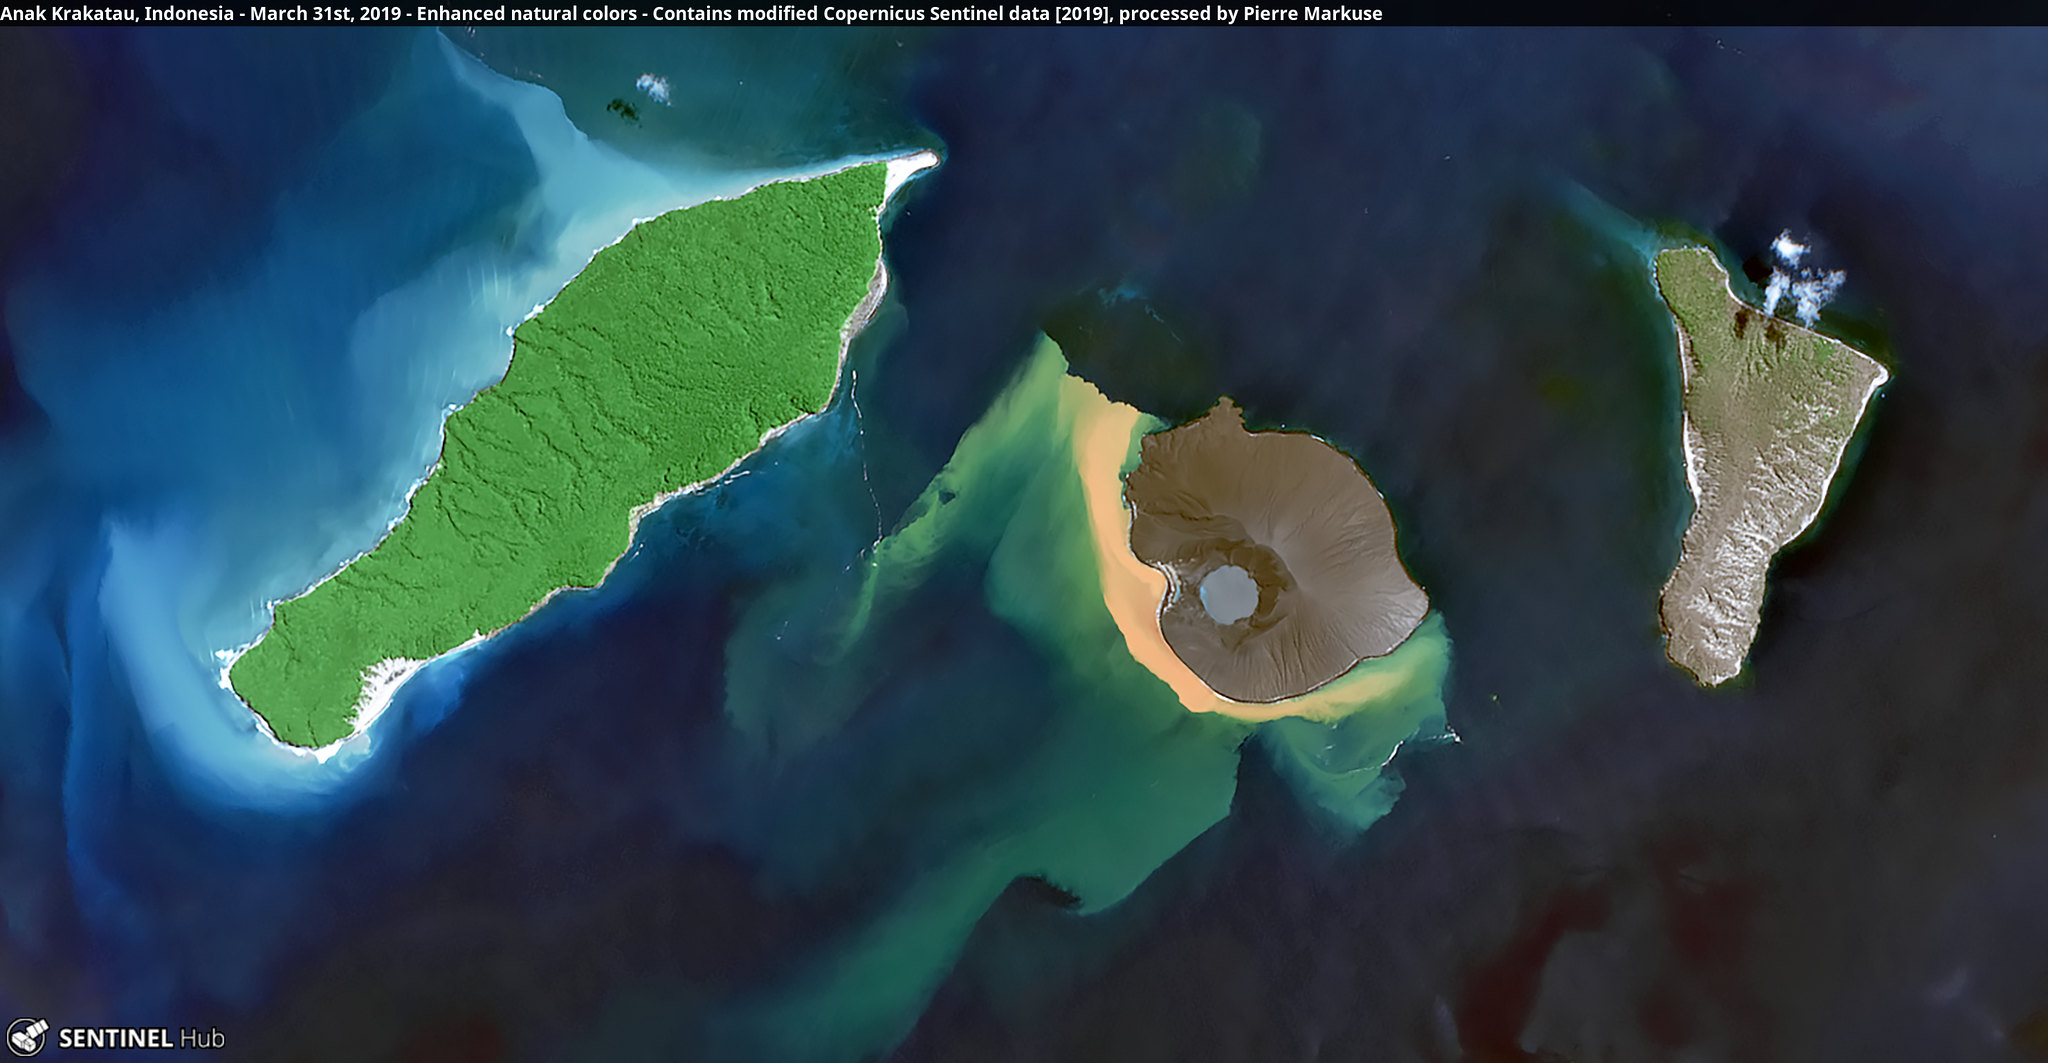 Anak Krakatau, Indonesia - March 31st, 2019